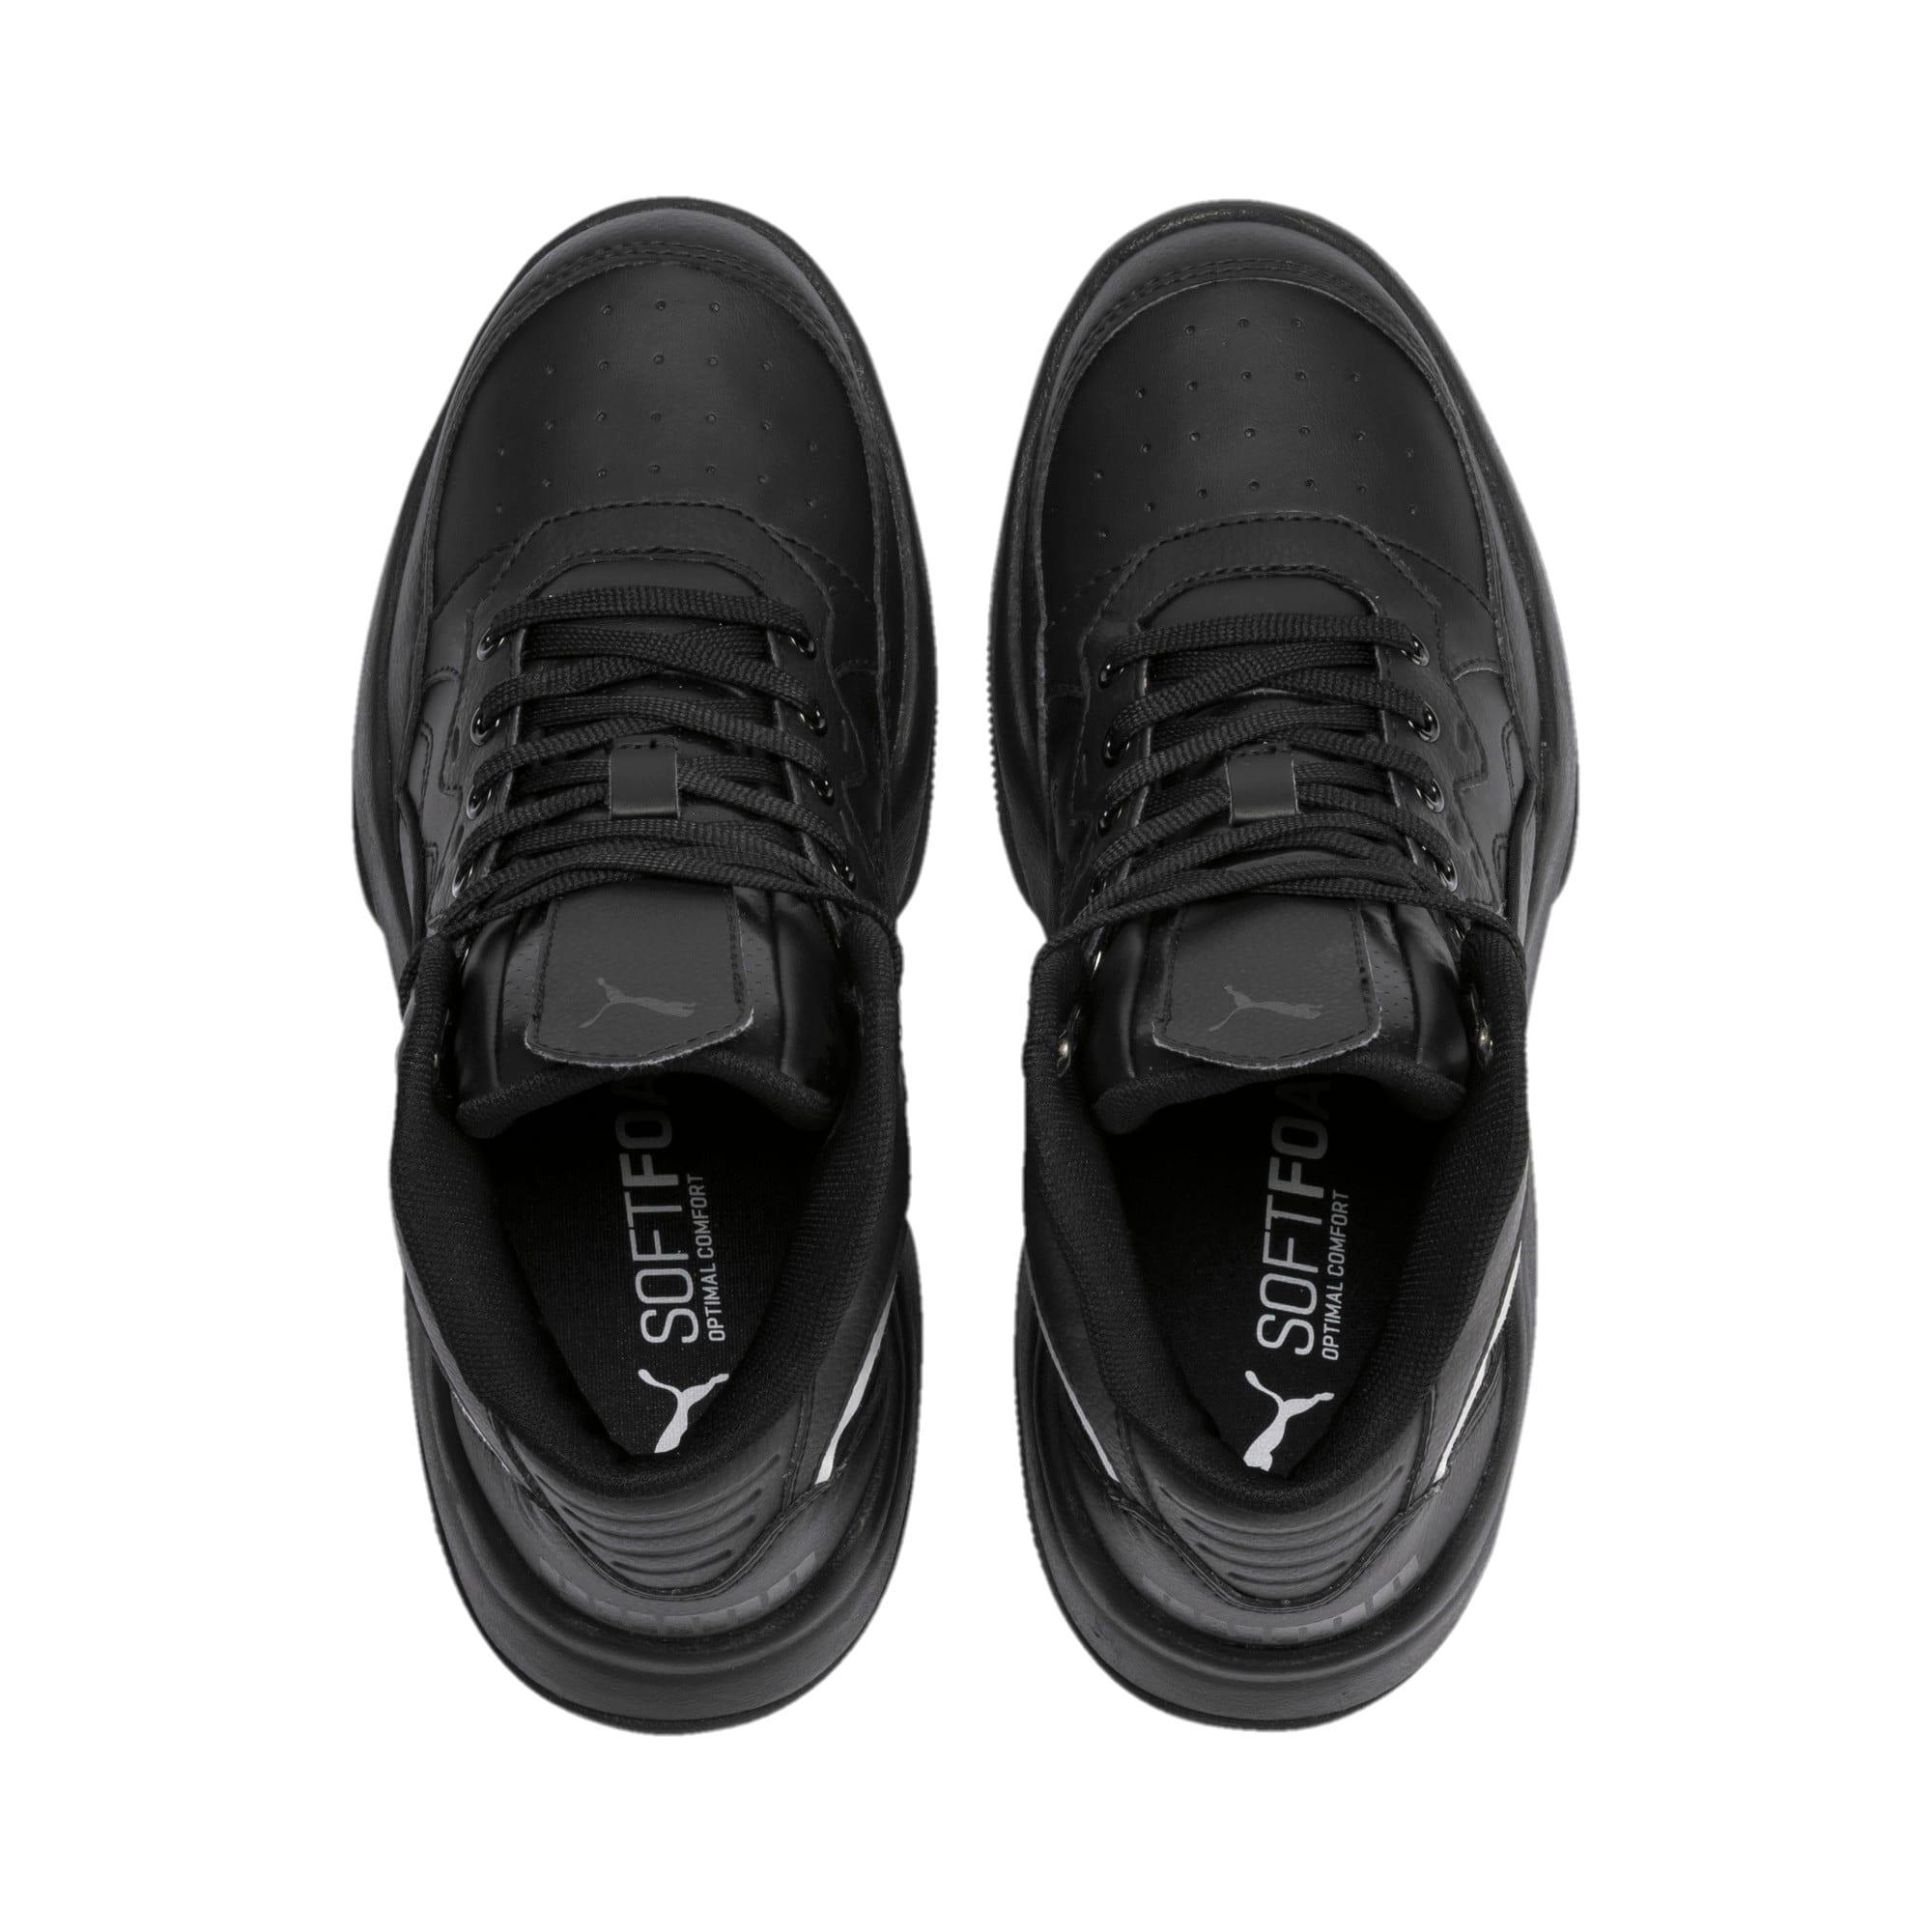 Thumbnail 6 of PUMA Rebound Playoff SL Sneakers JR, Puma Black-Puma Silver, medium